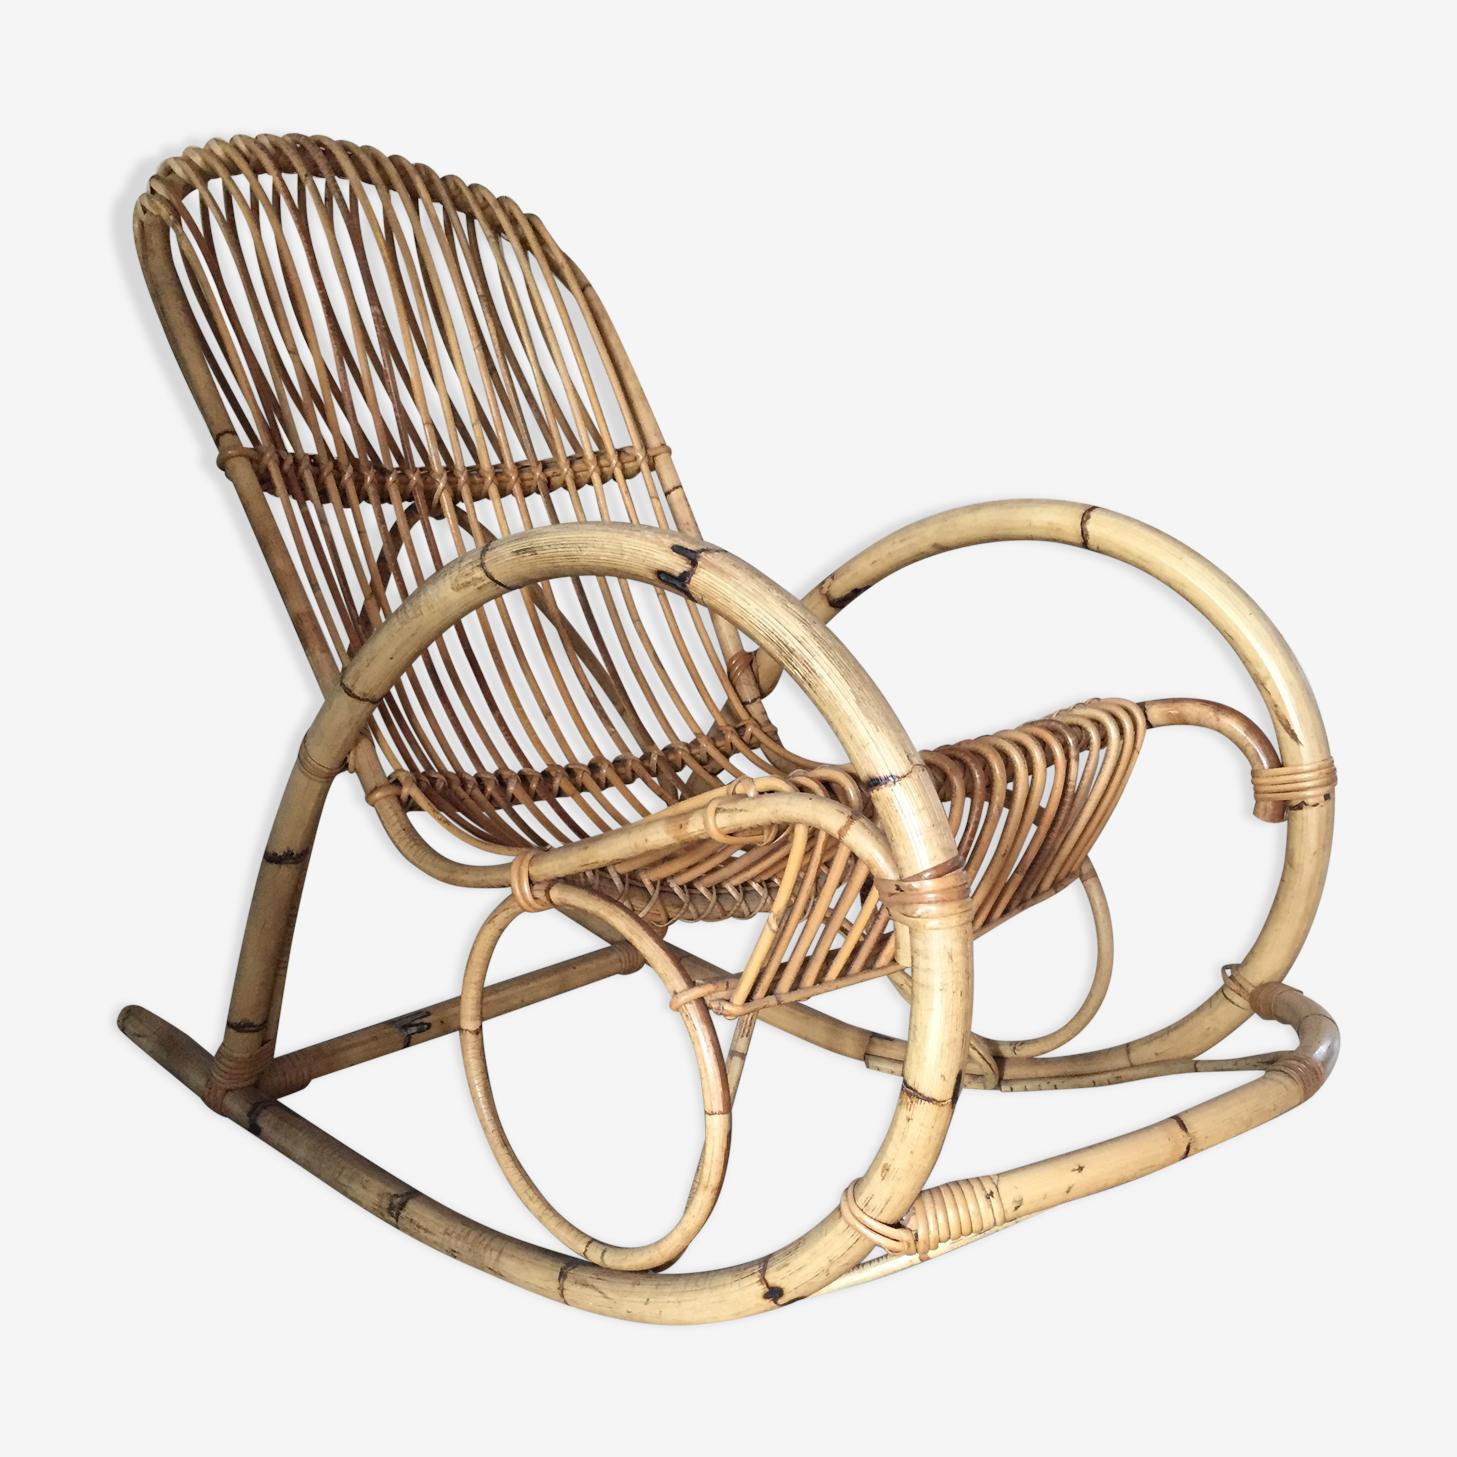 Adult rattan rocking chair